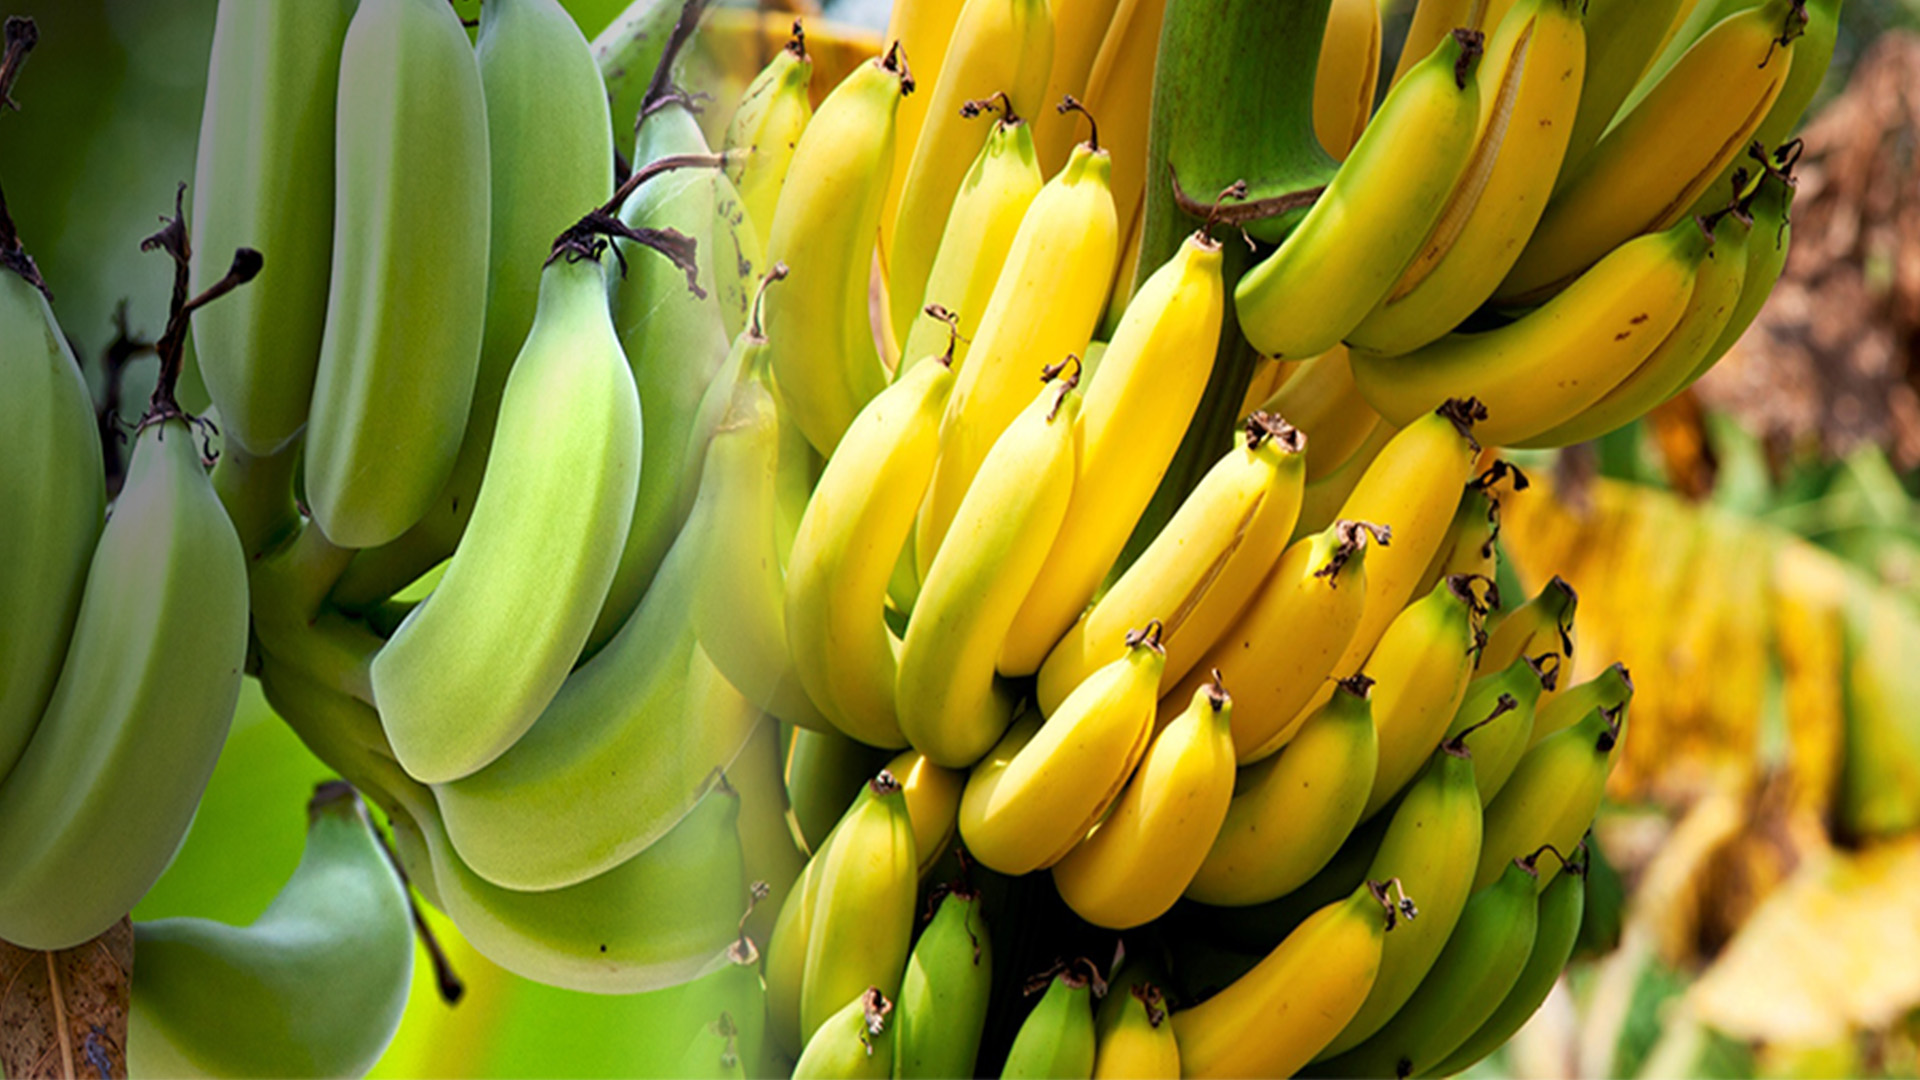 Banana - Ripening Chamber